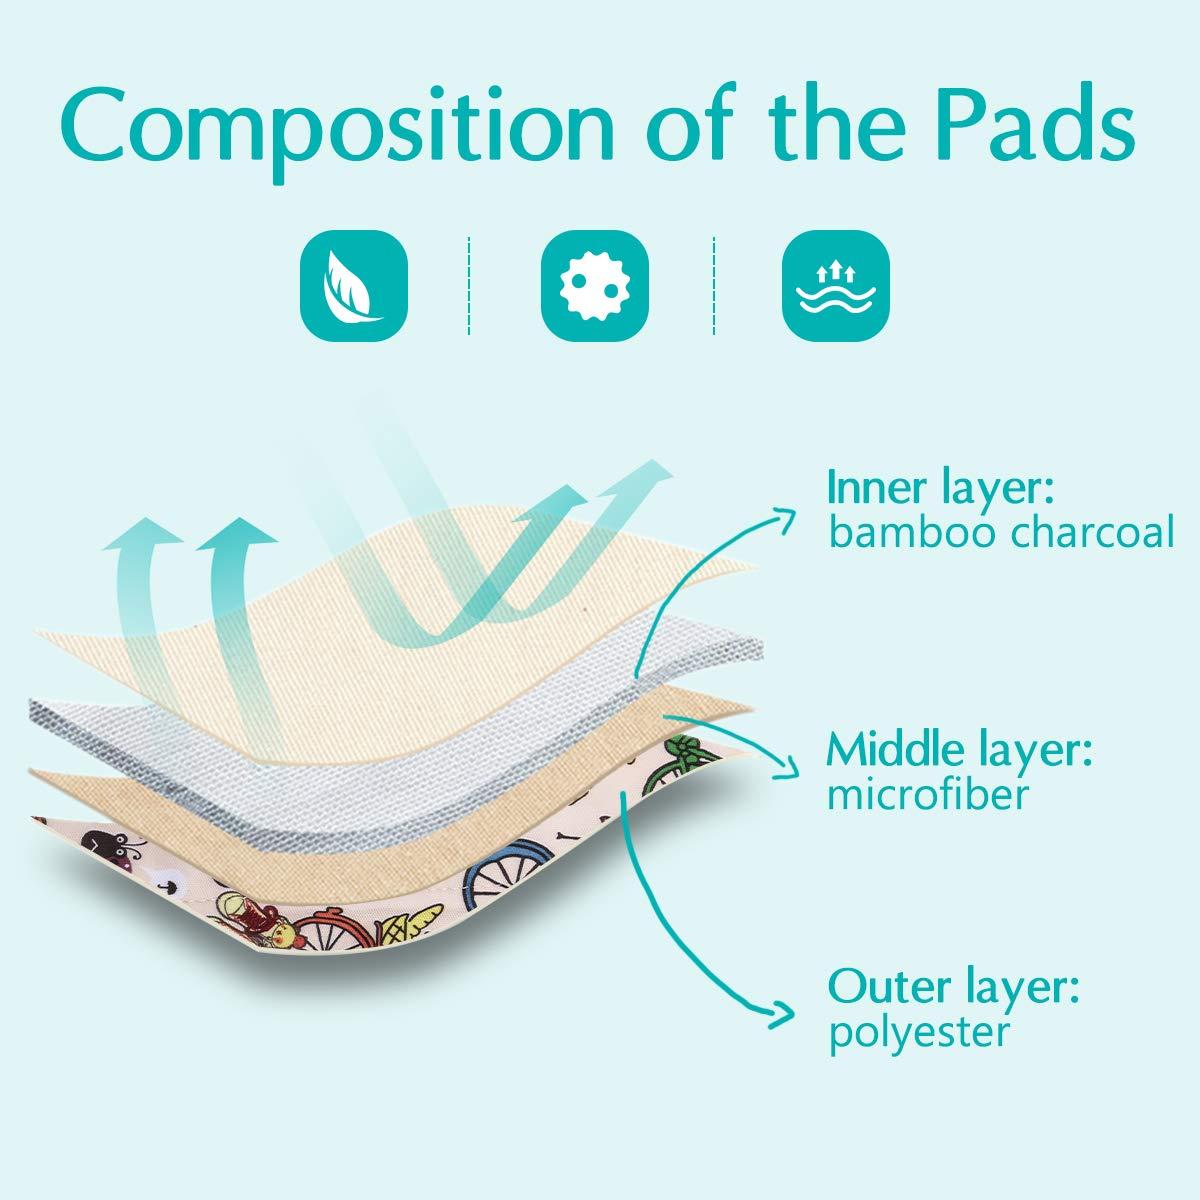 Wipalo Reutilizables de Carbón de Bambú 8PCS Menstrual Reutilizable Súper Absorbencia Con Bolsa de Transporte Sanitario Lavable Reutilizable Almohadilla ...